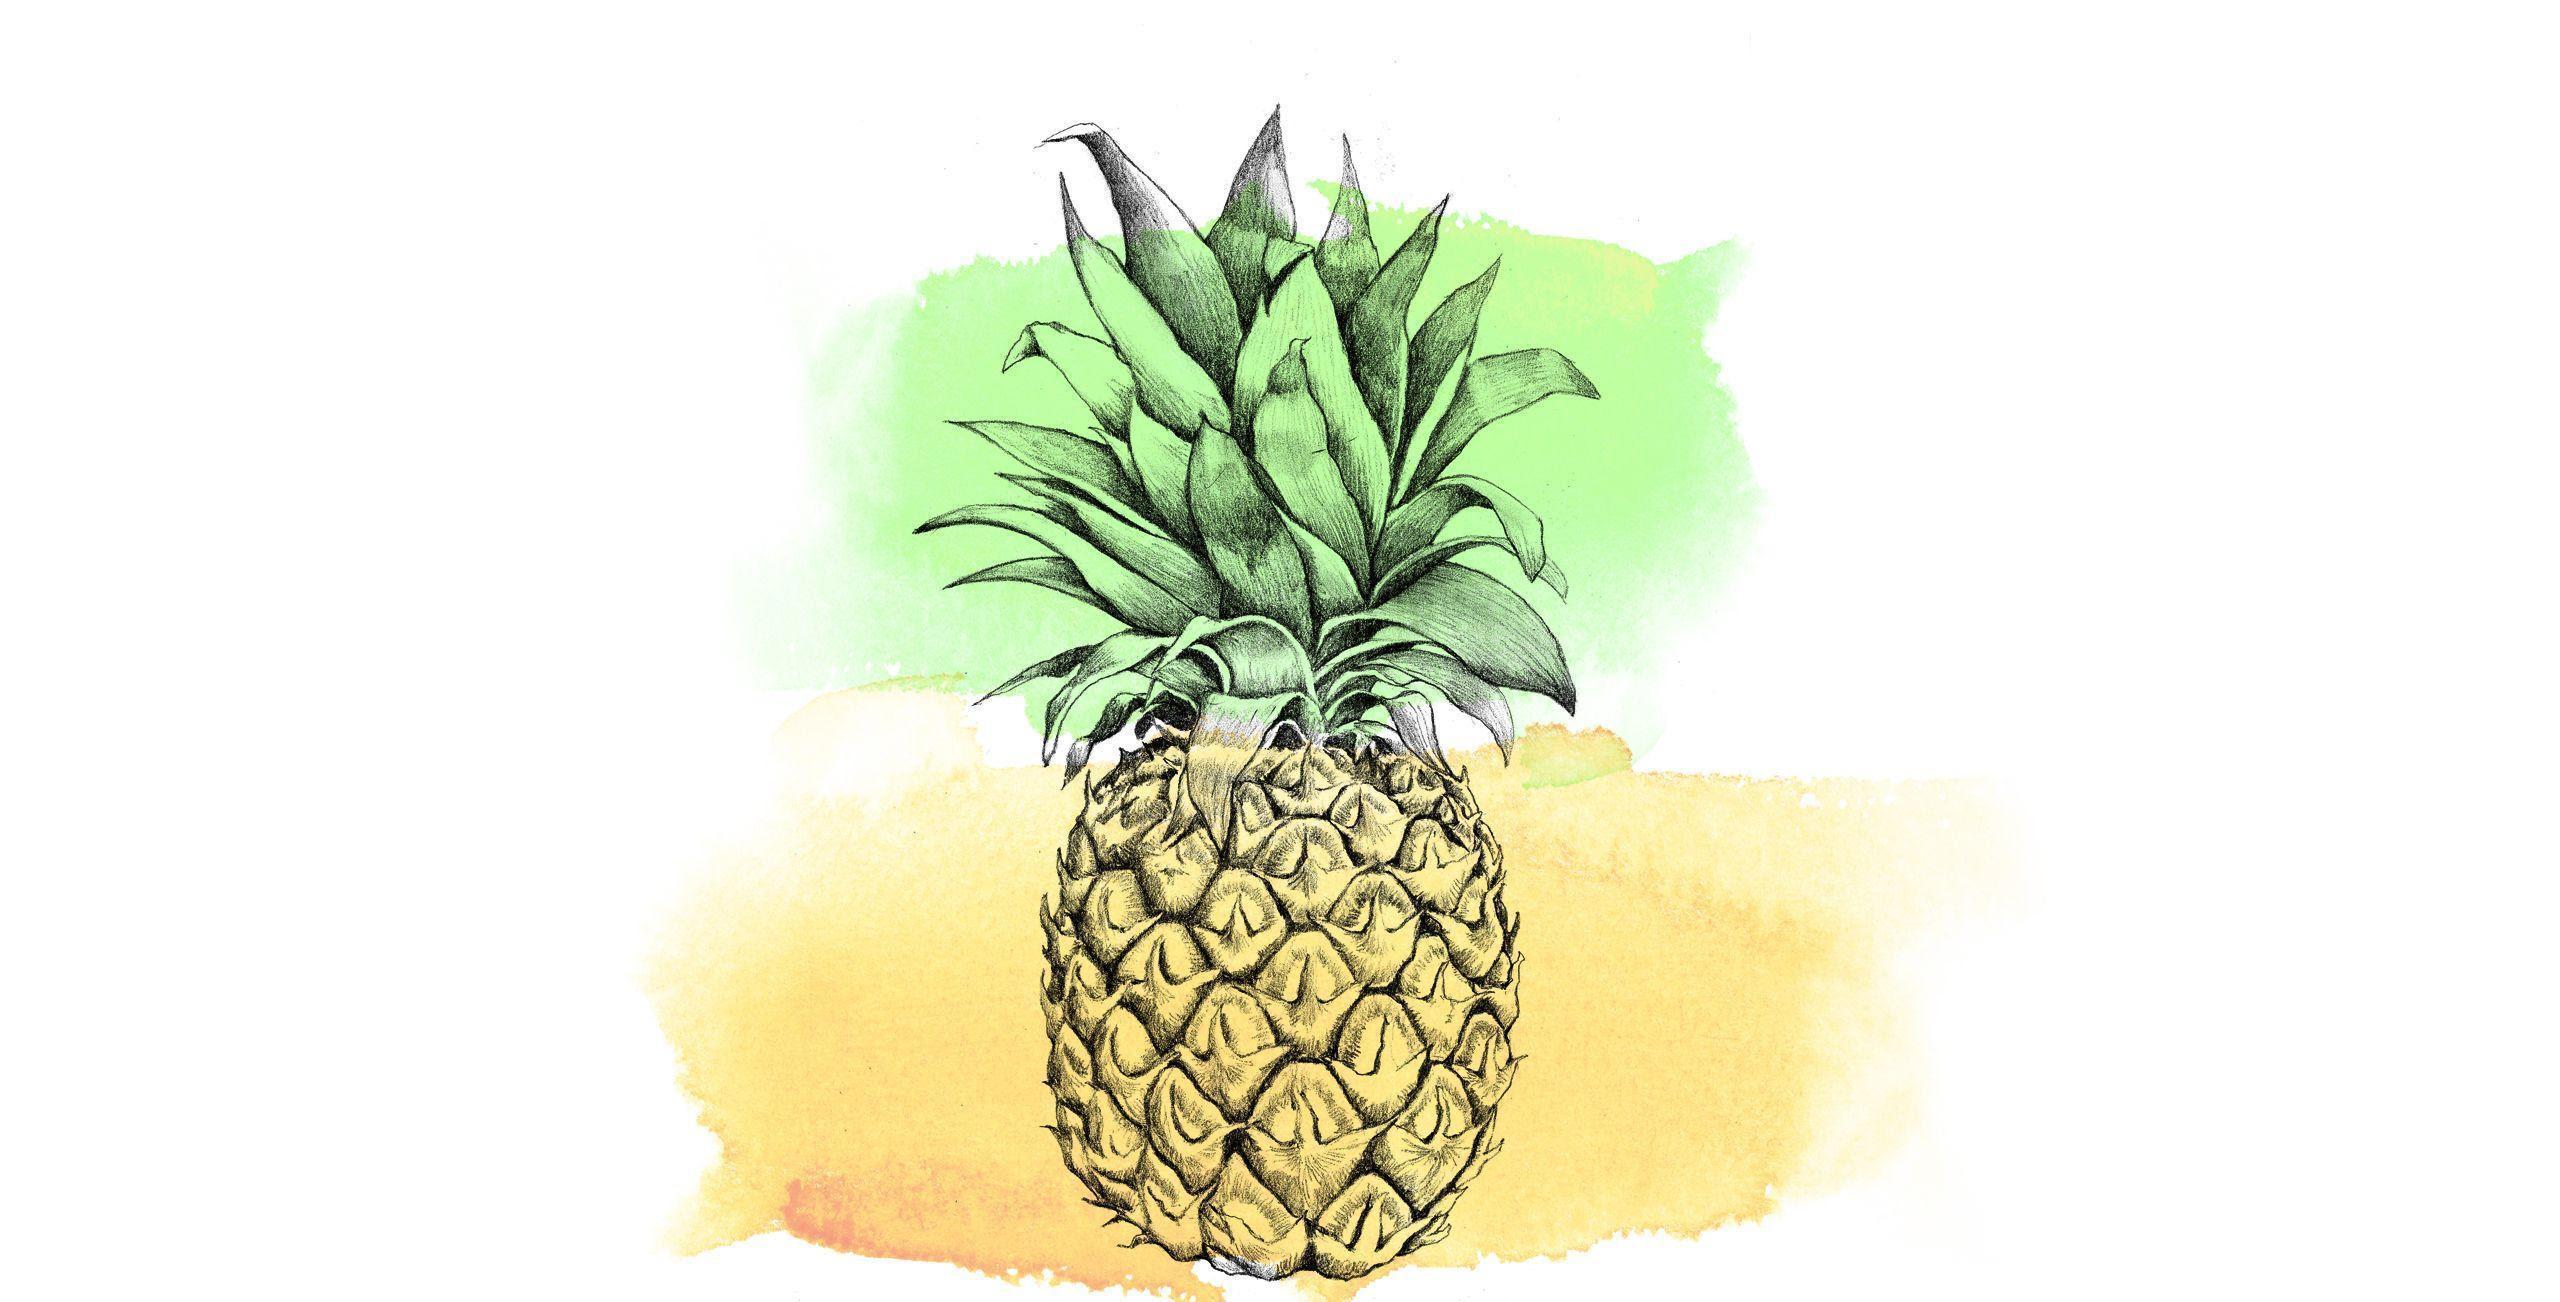 Pineapple Wallpapers - Wallpaper Cave